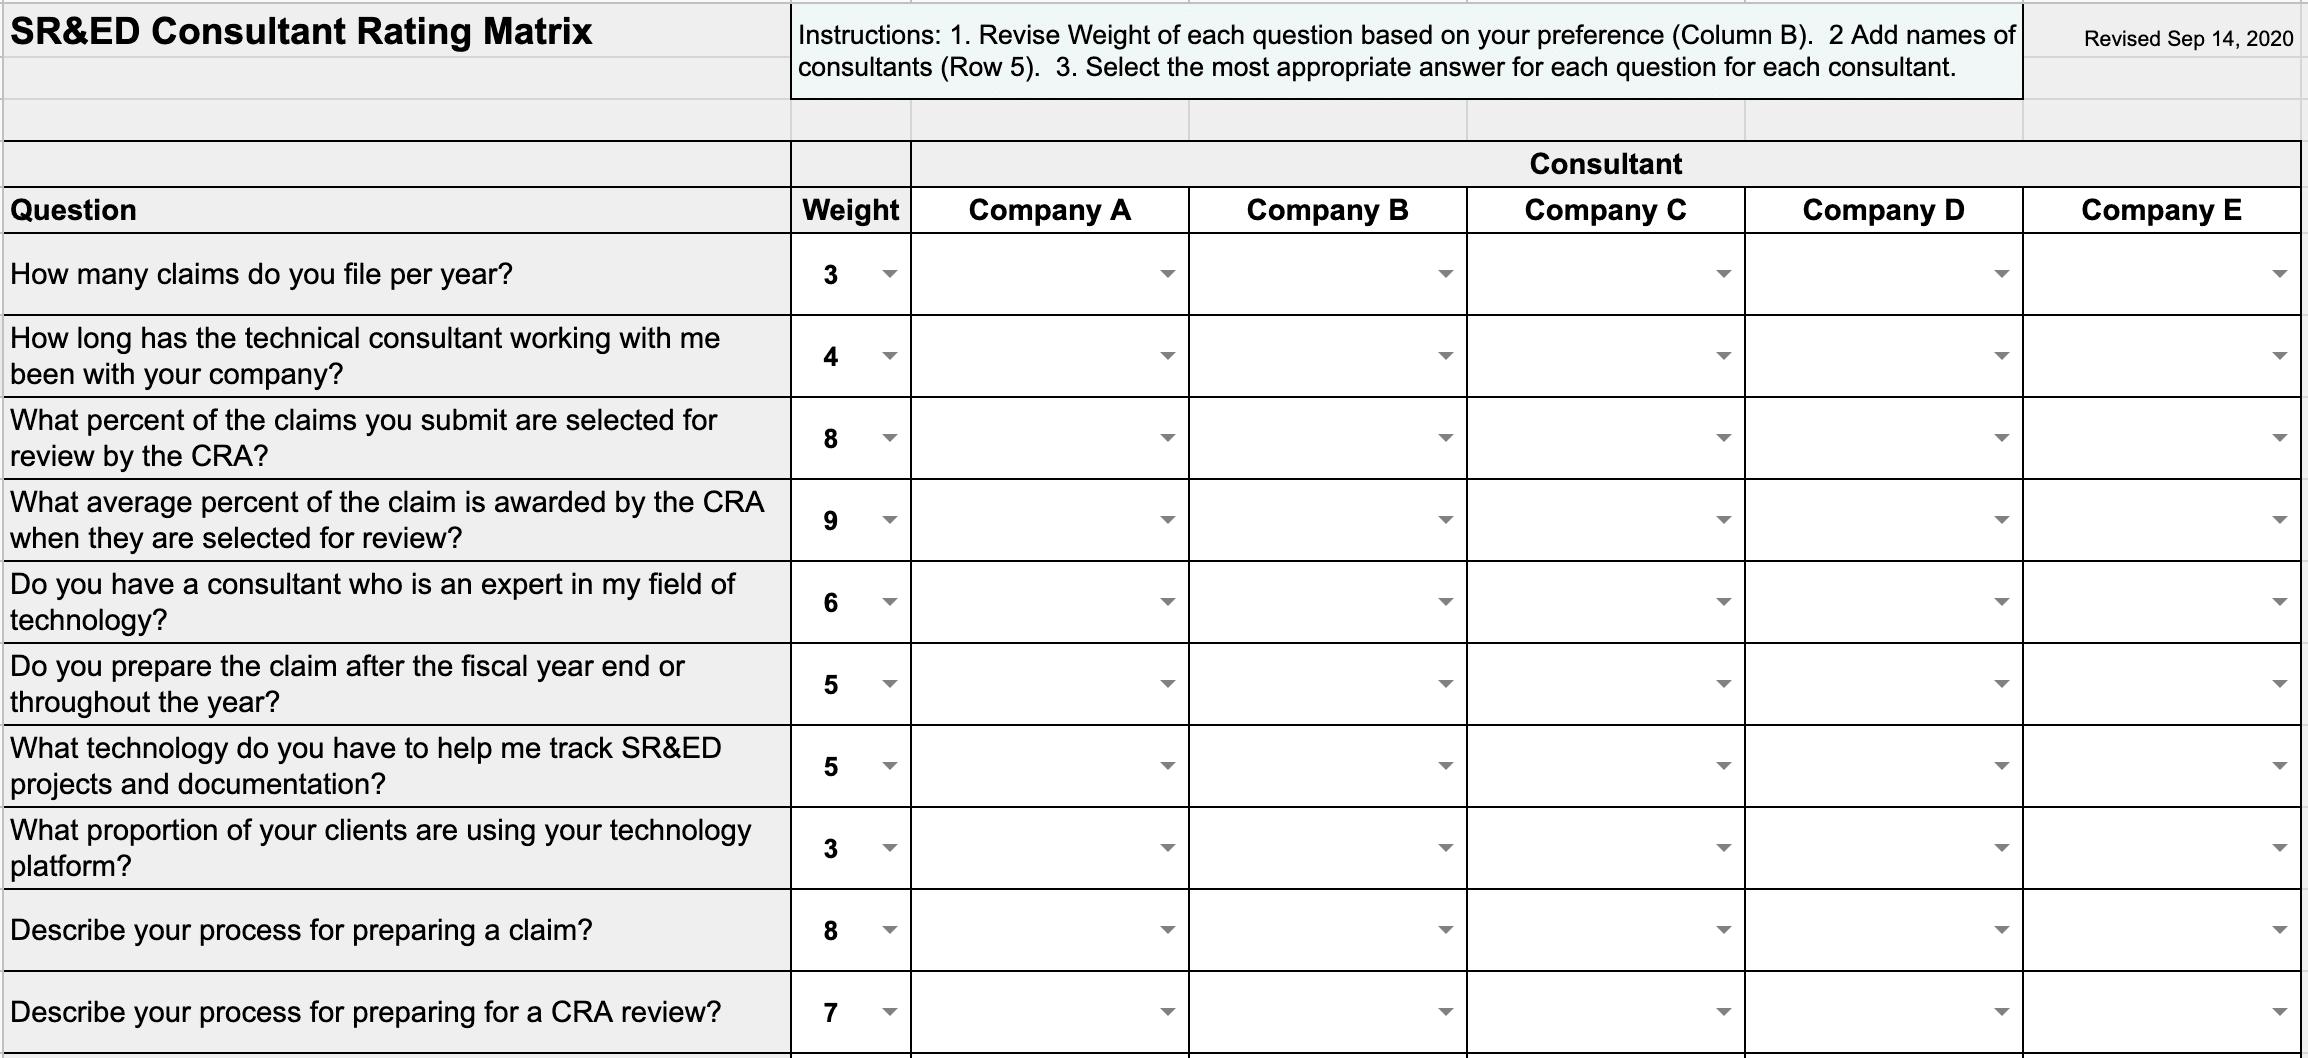 SRED consultant rating matrix